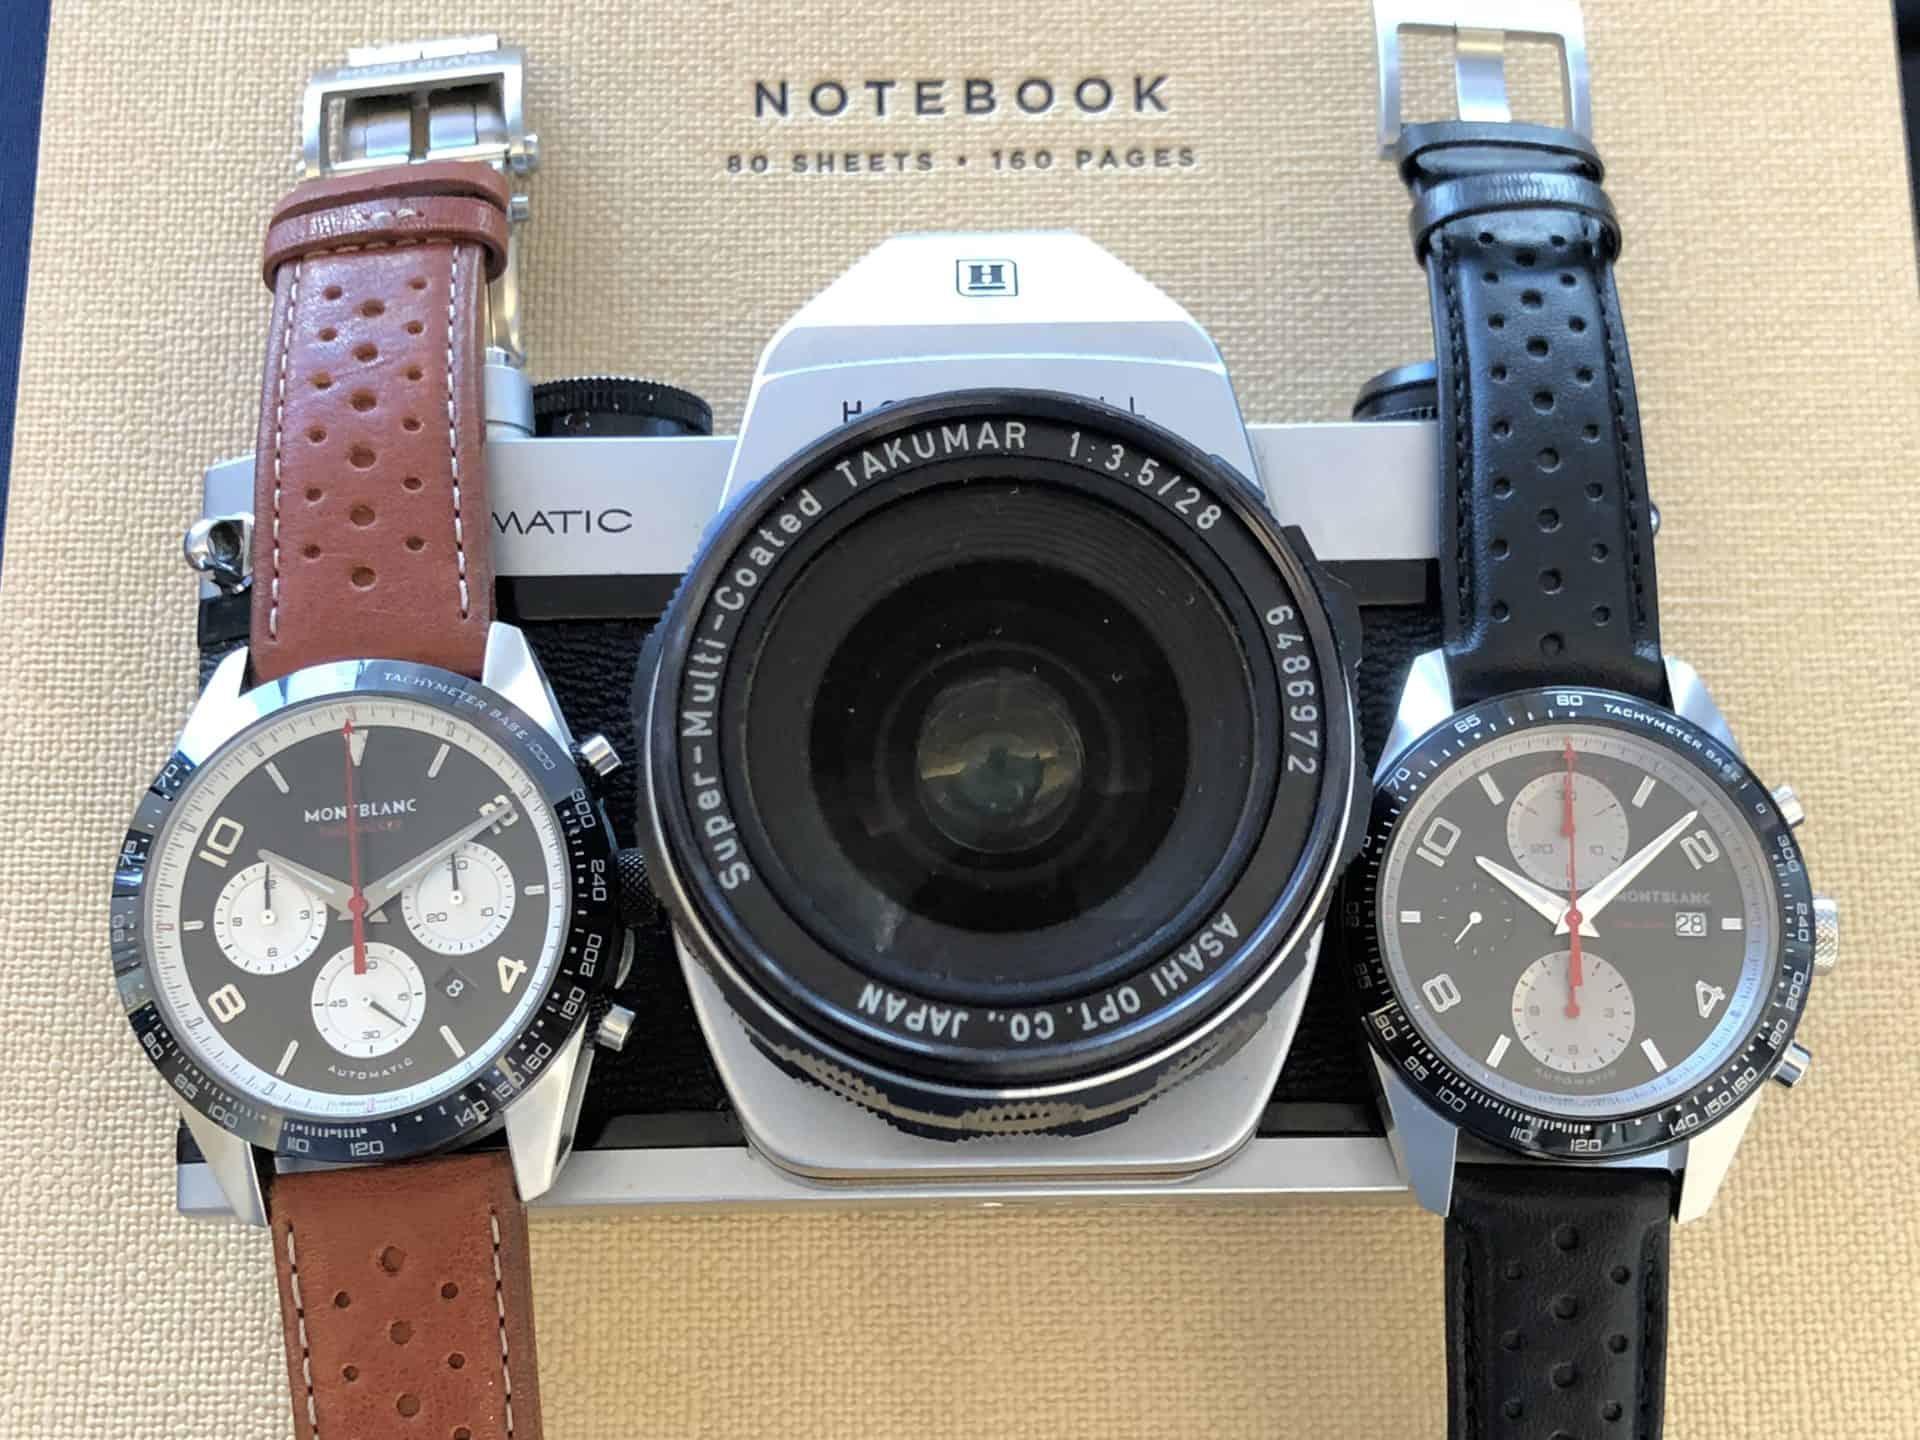 Montblanc TimeWalker Manufacture Chronograph, 4.990 Euro und TimeWalker Automatic Chronograph Reverse Panda, 3.200 Euro